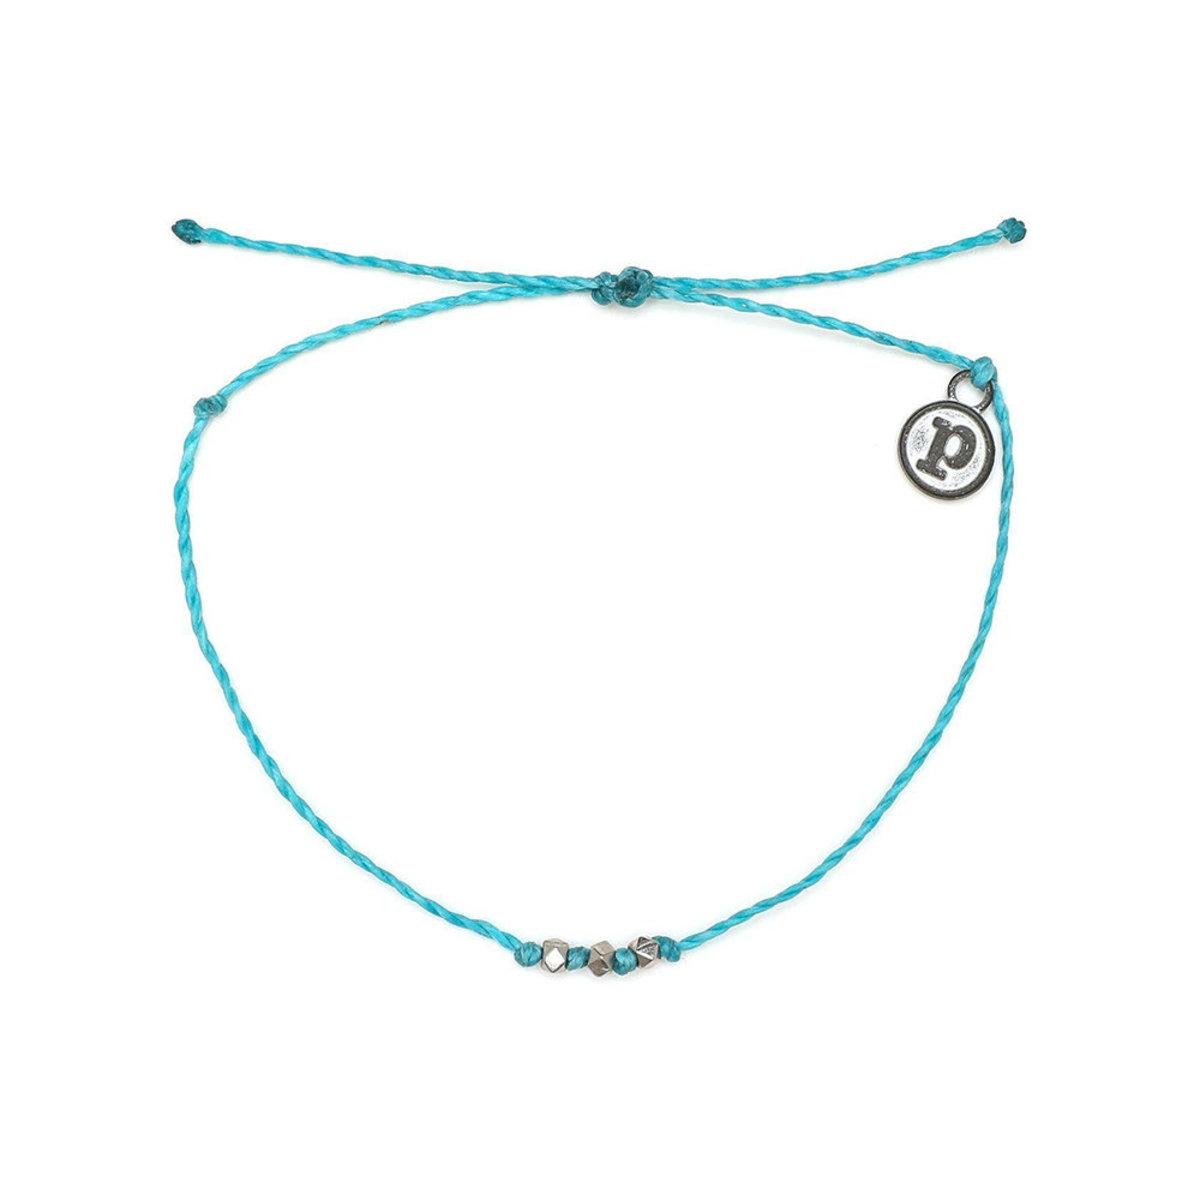 Silver Delicate 3 Bead Bracelet・Light Blue